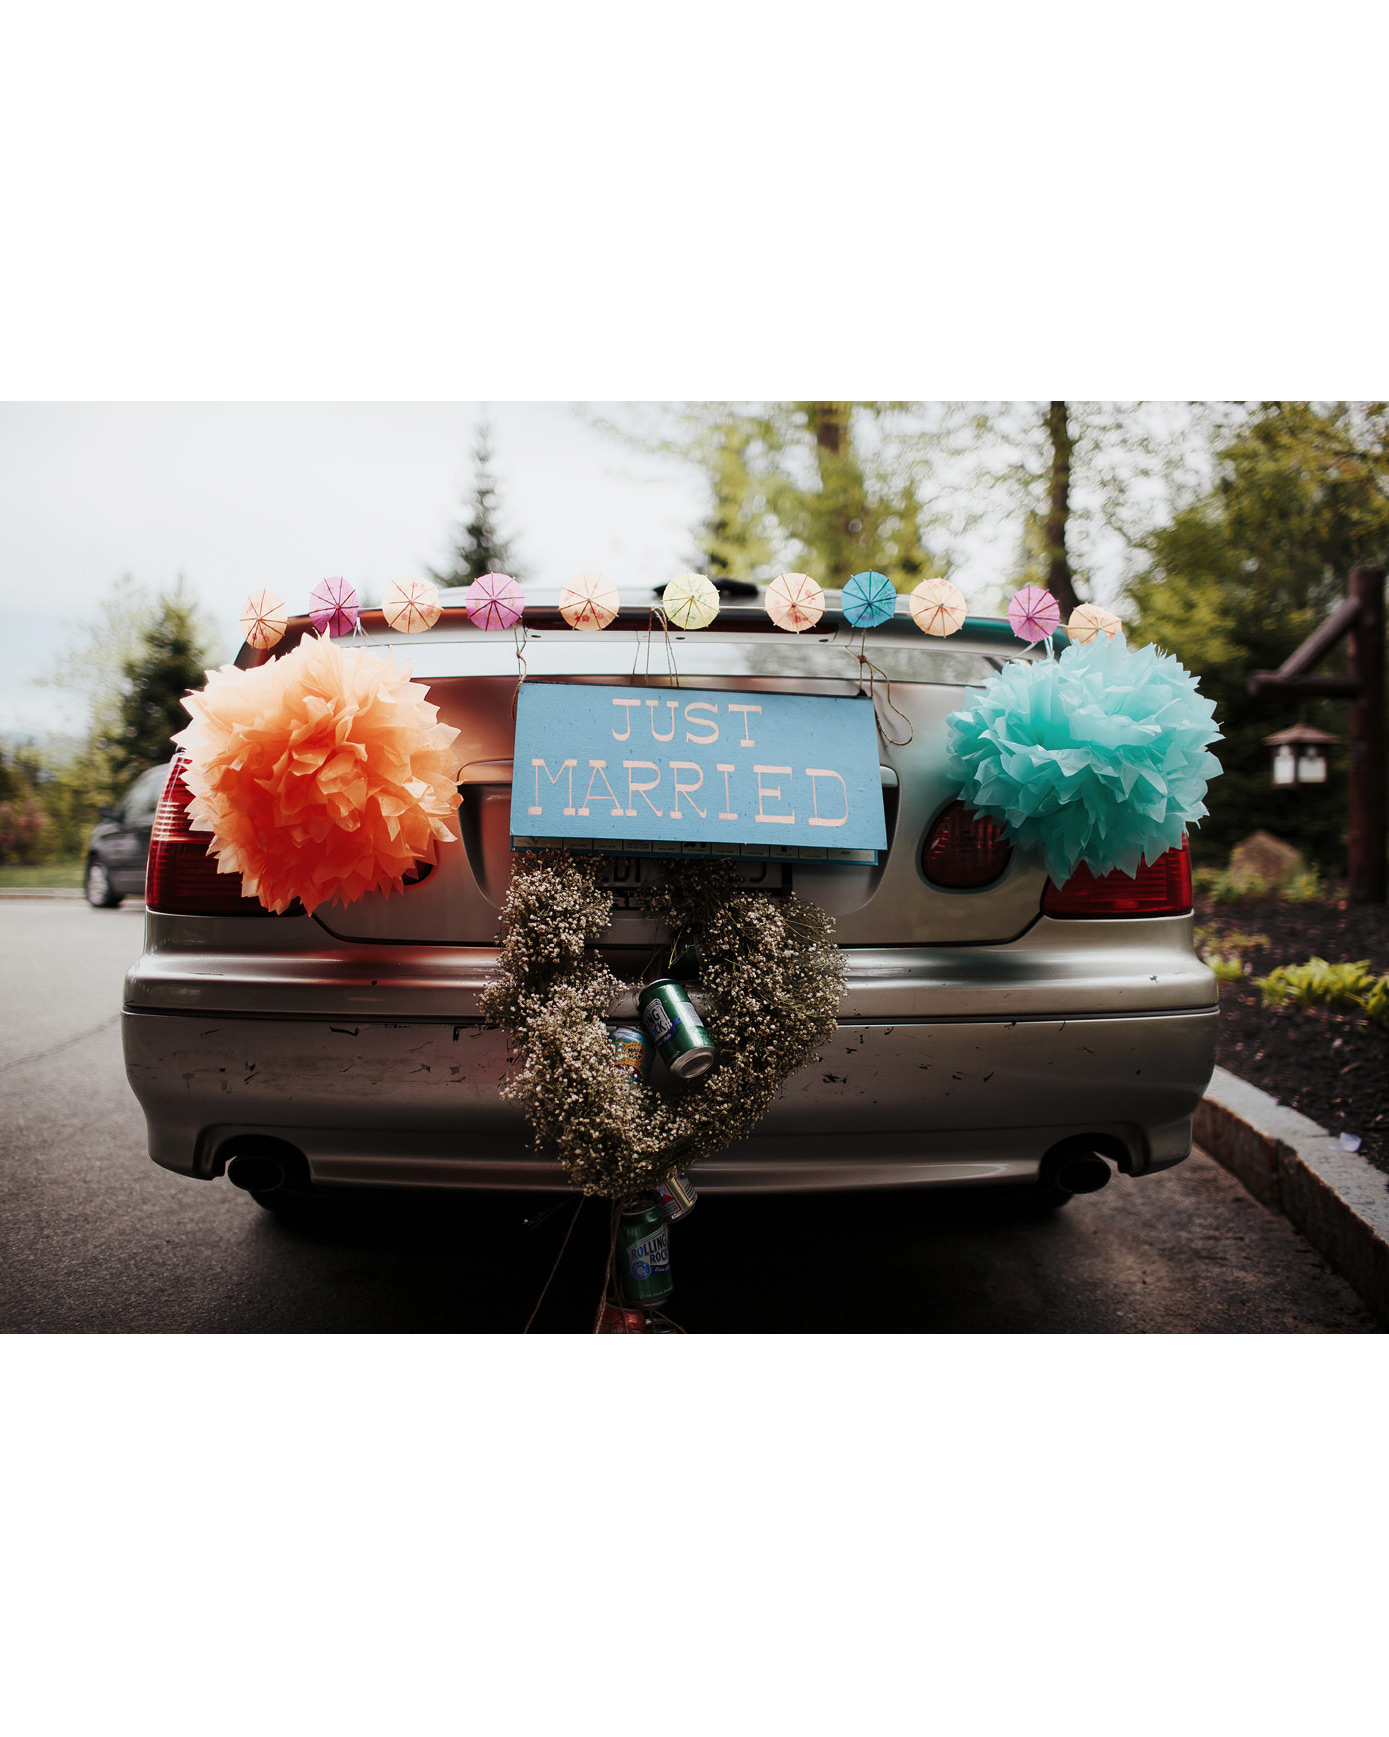 ryan-alan-wedding-getaway-car-0050-s112966-0516.jpg